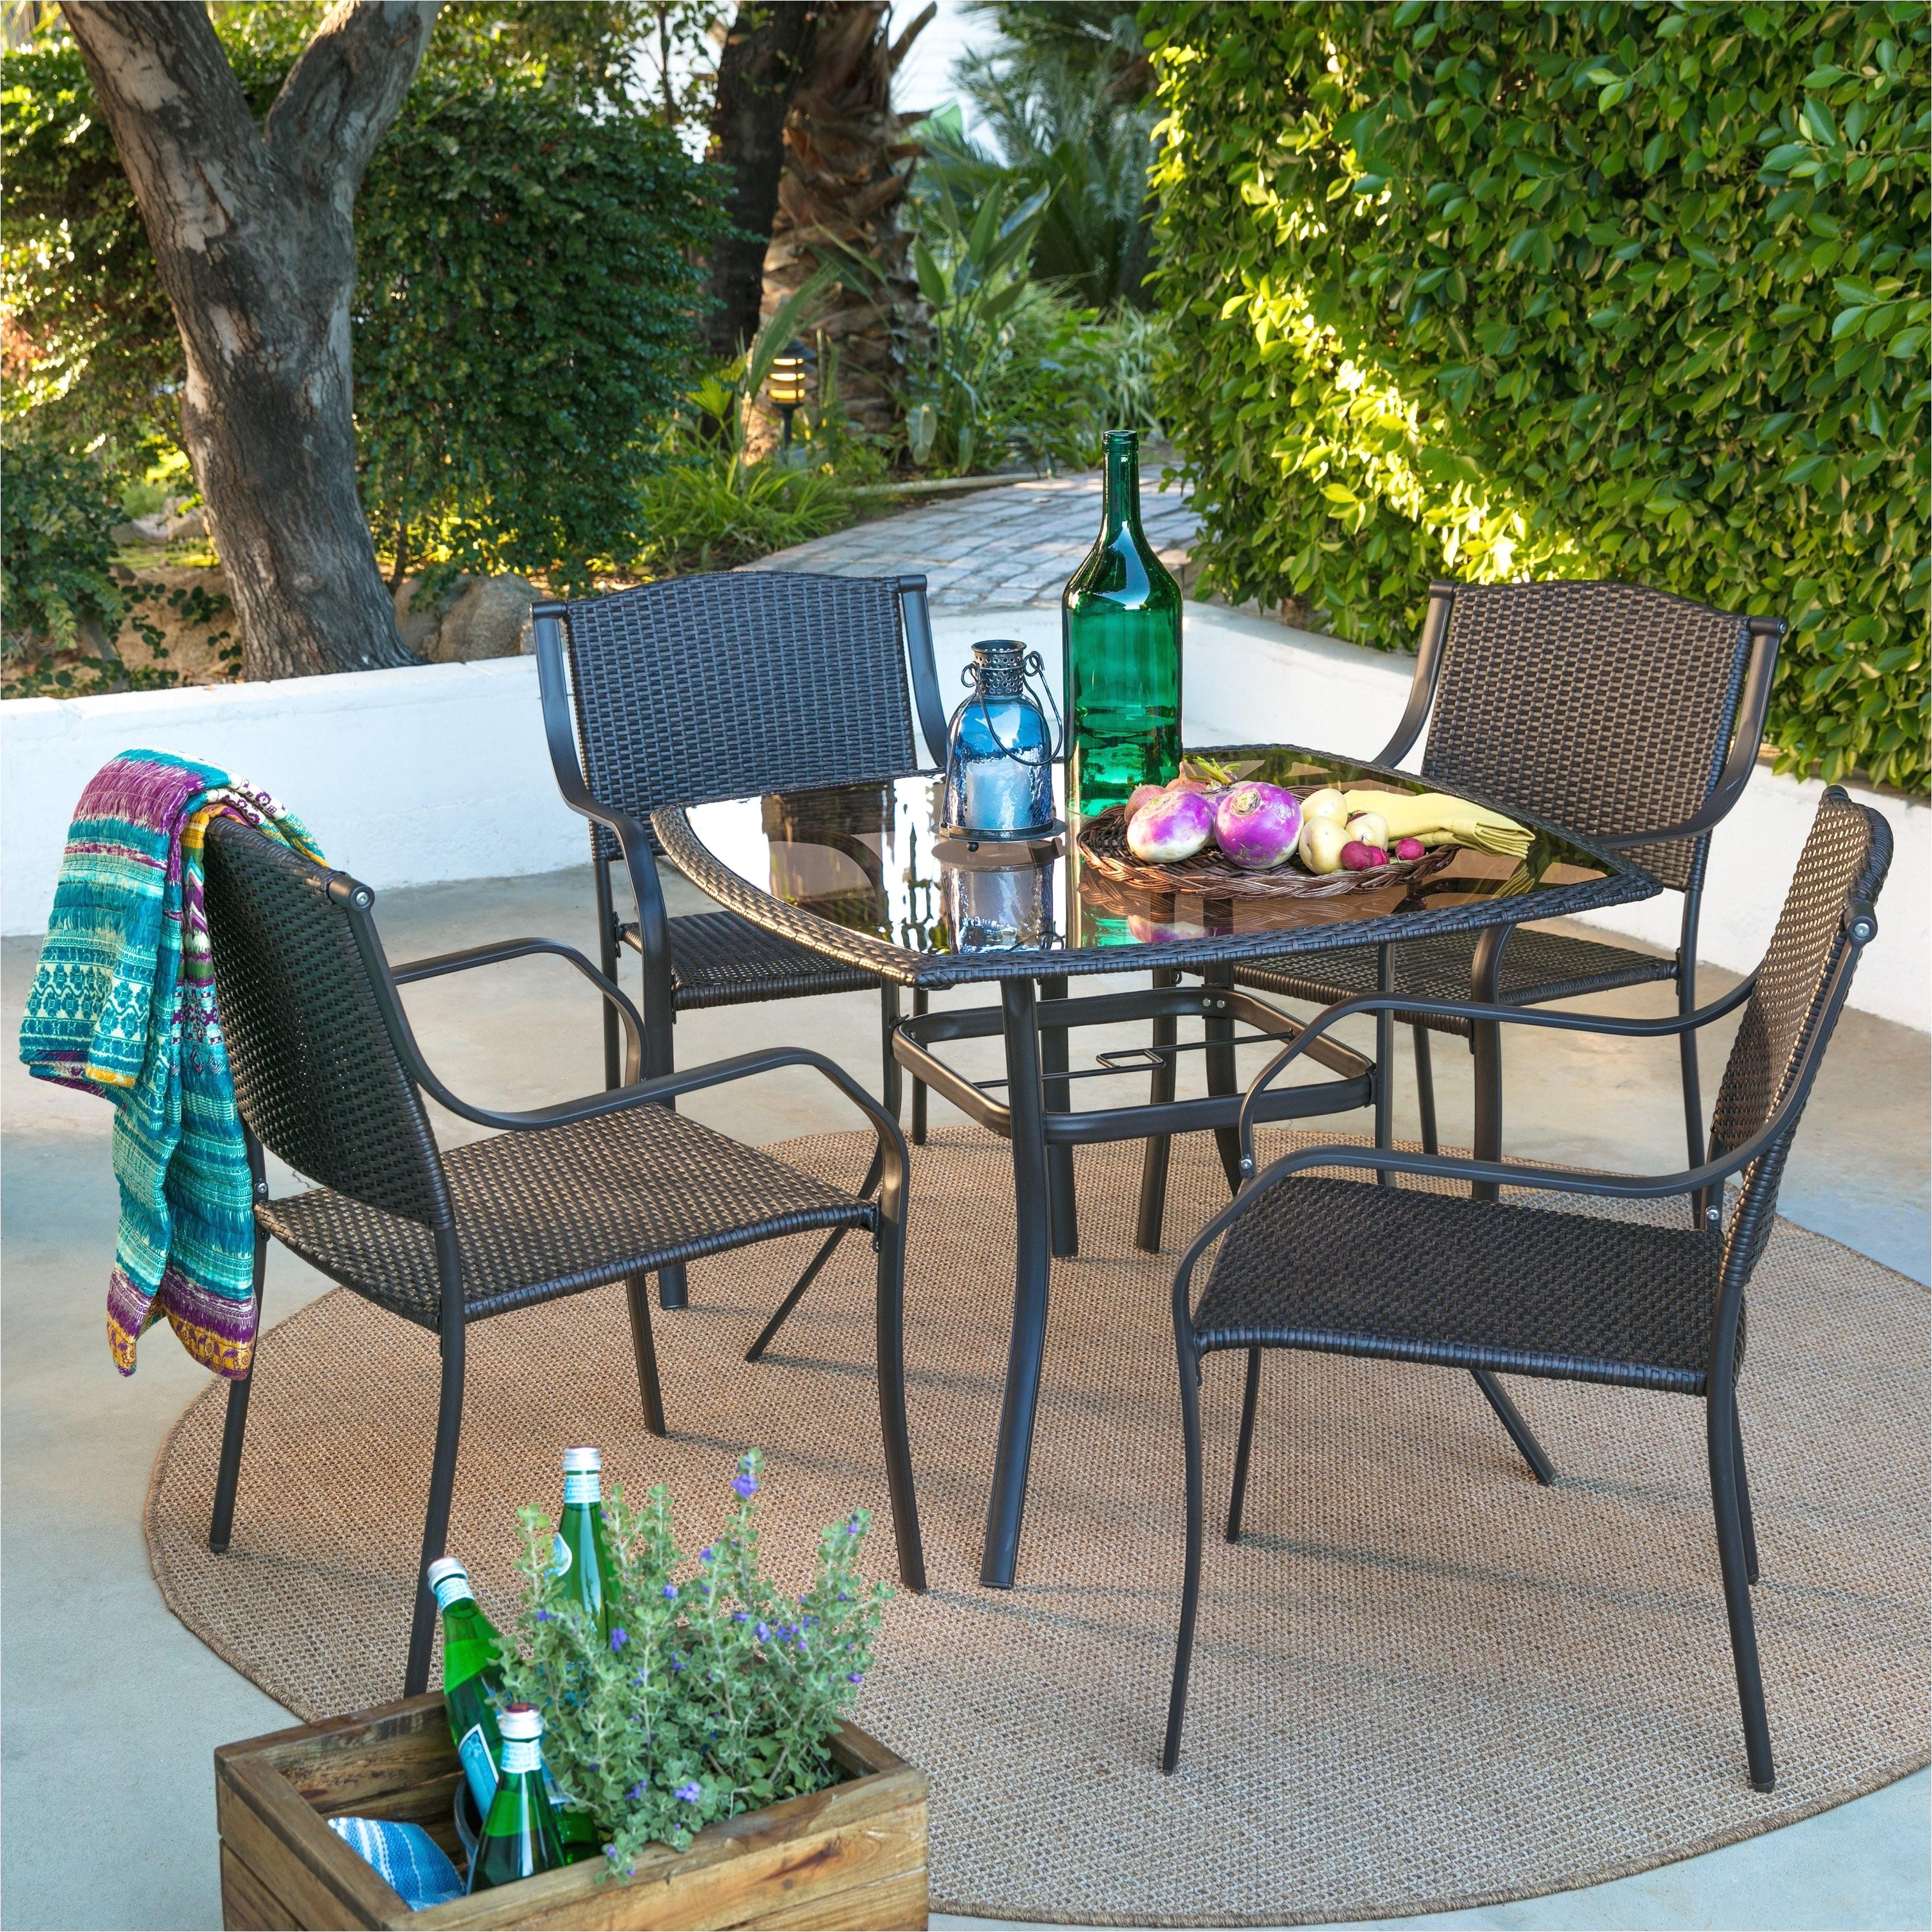 2a—4 patio furniture coral coast patio furniture fresh wicker outdoor sofa 0d patio